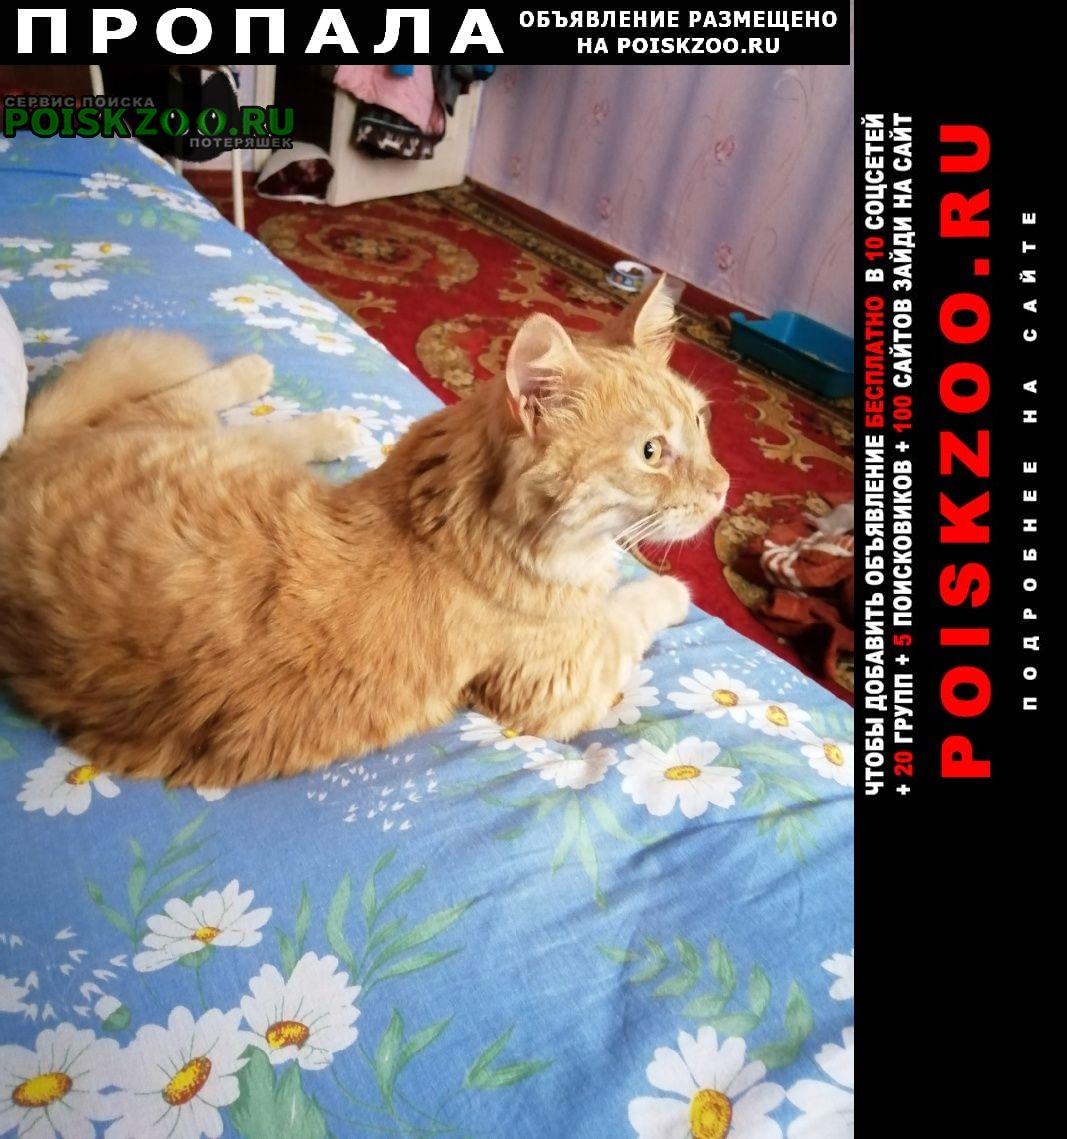 Пропала кошка кот. не появлялся дома уже 2 дня. Анапа